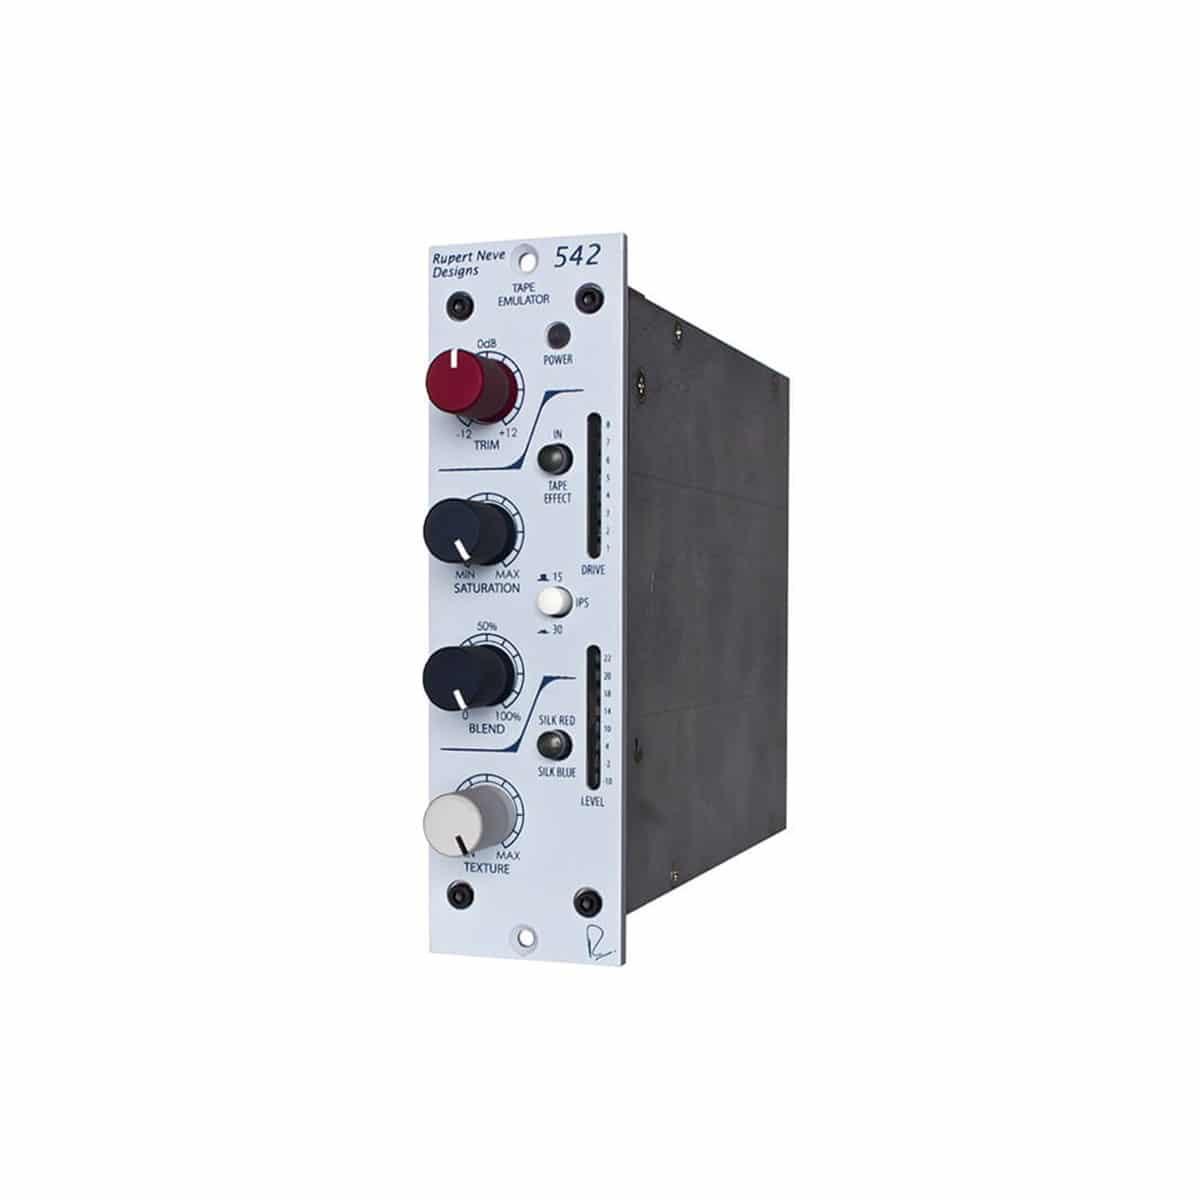 Rupert Neve 542 03 Effetti, Pro Audio, Outboard, Compressori